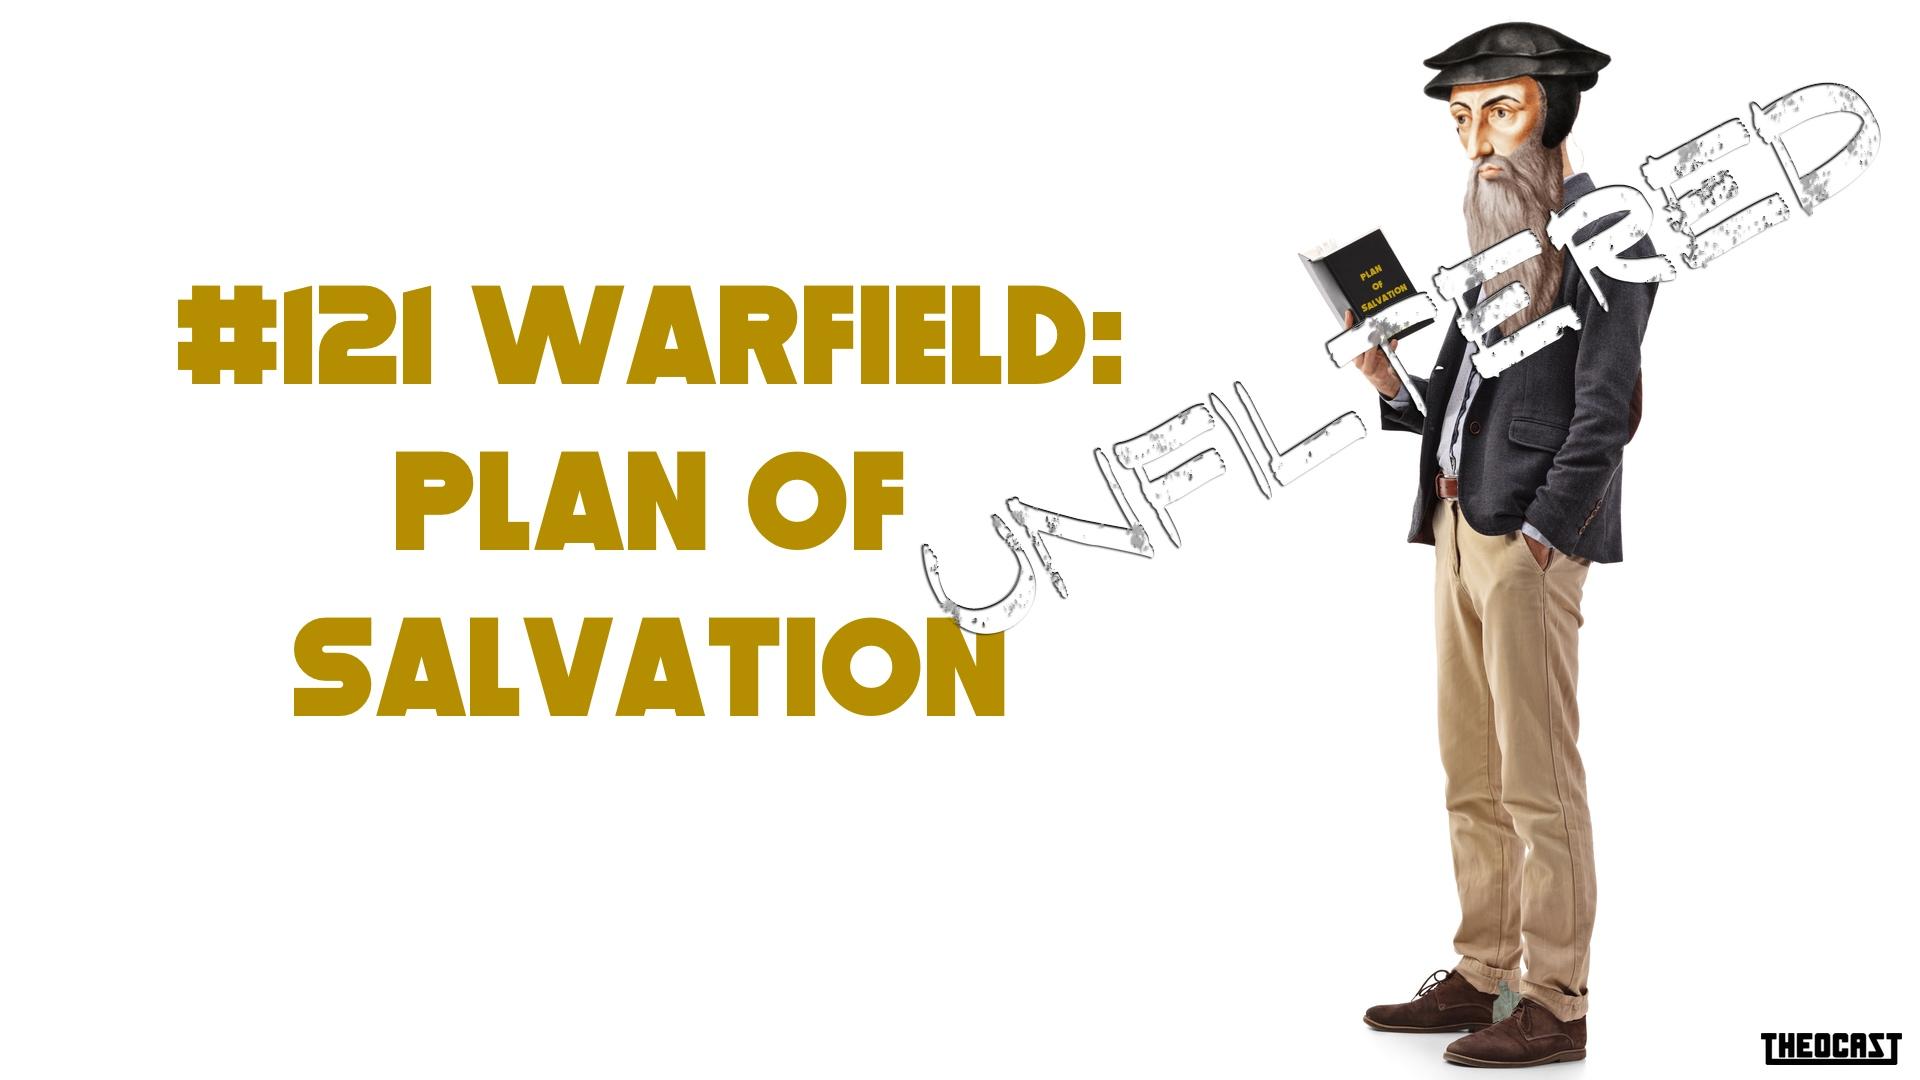 UNFILTERED#121 Warfield: Plan of Salvation